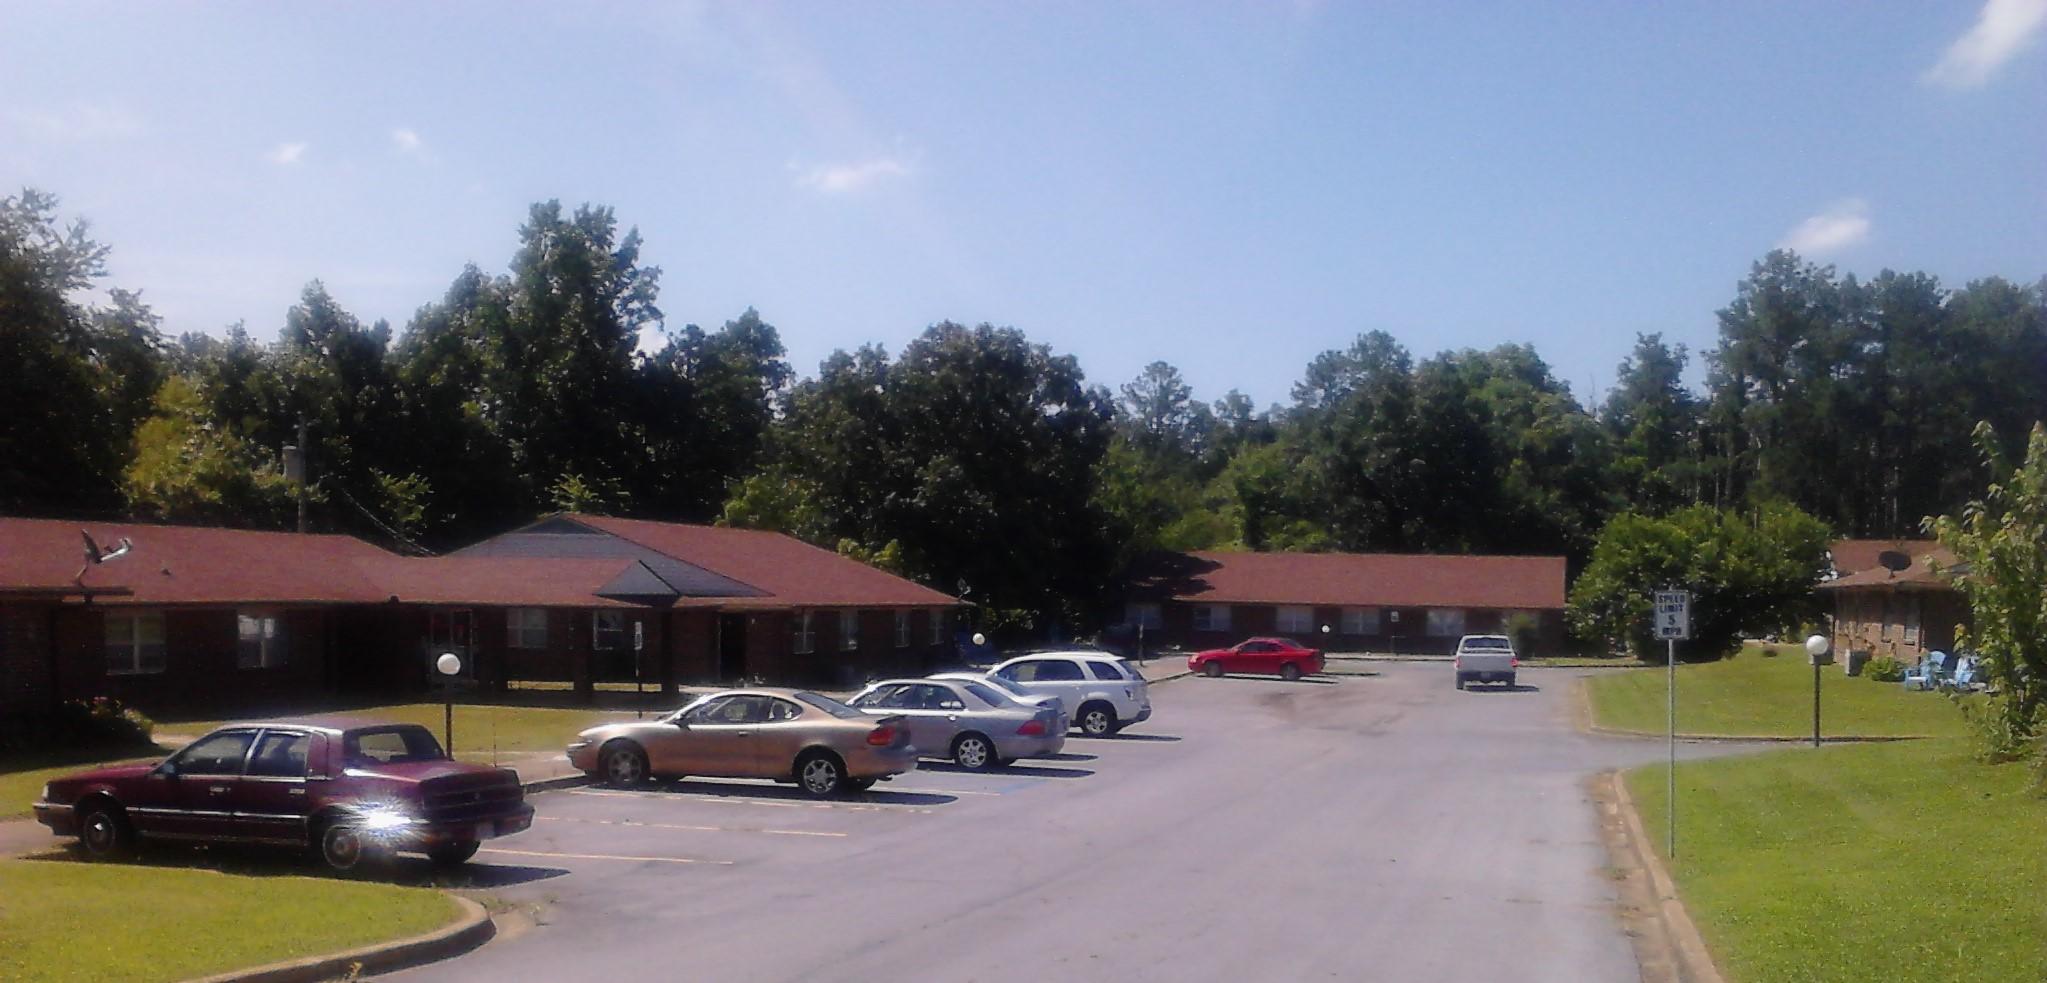 Image of Pine Village Apartments in Rainsville, Alabama